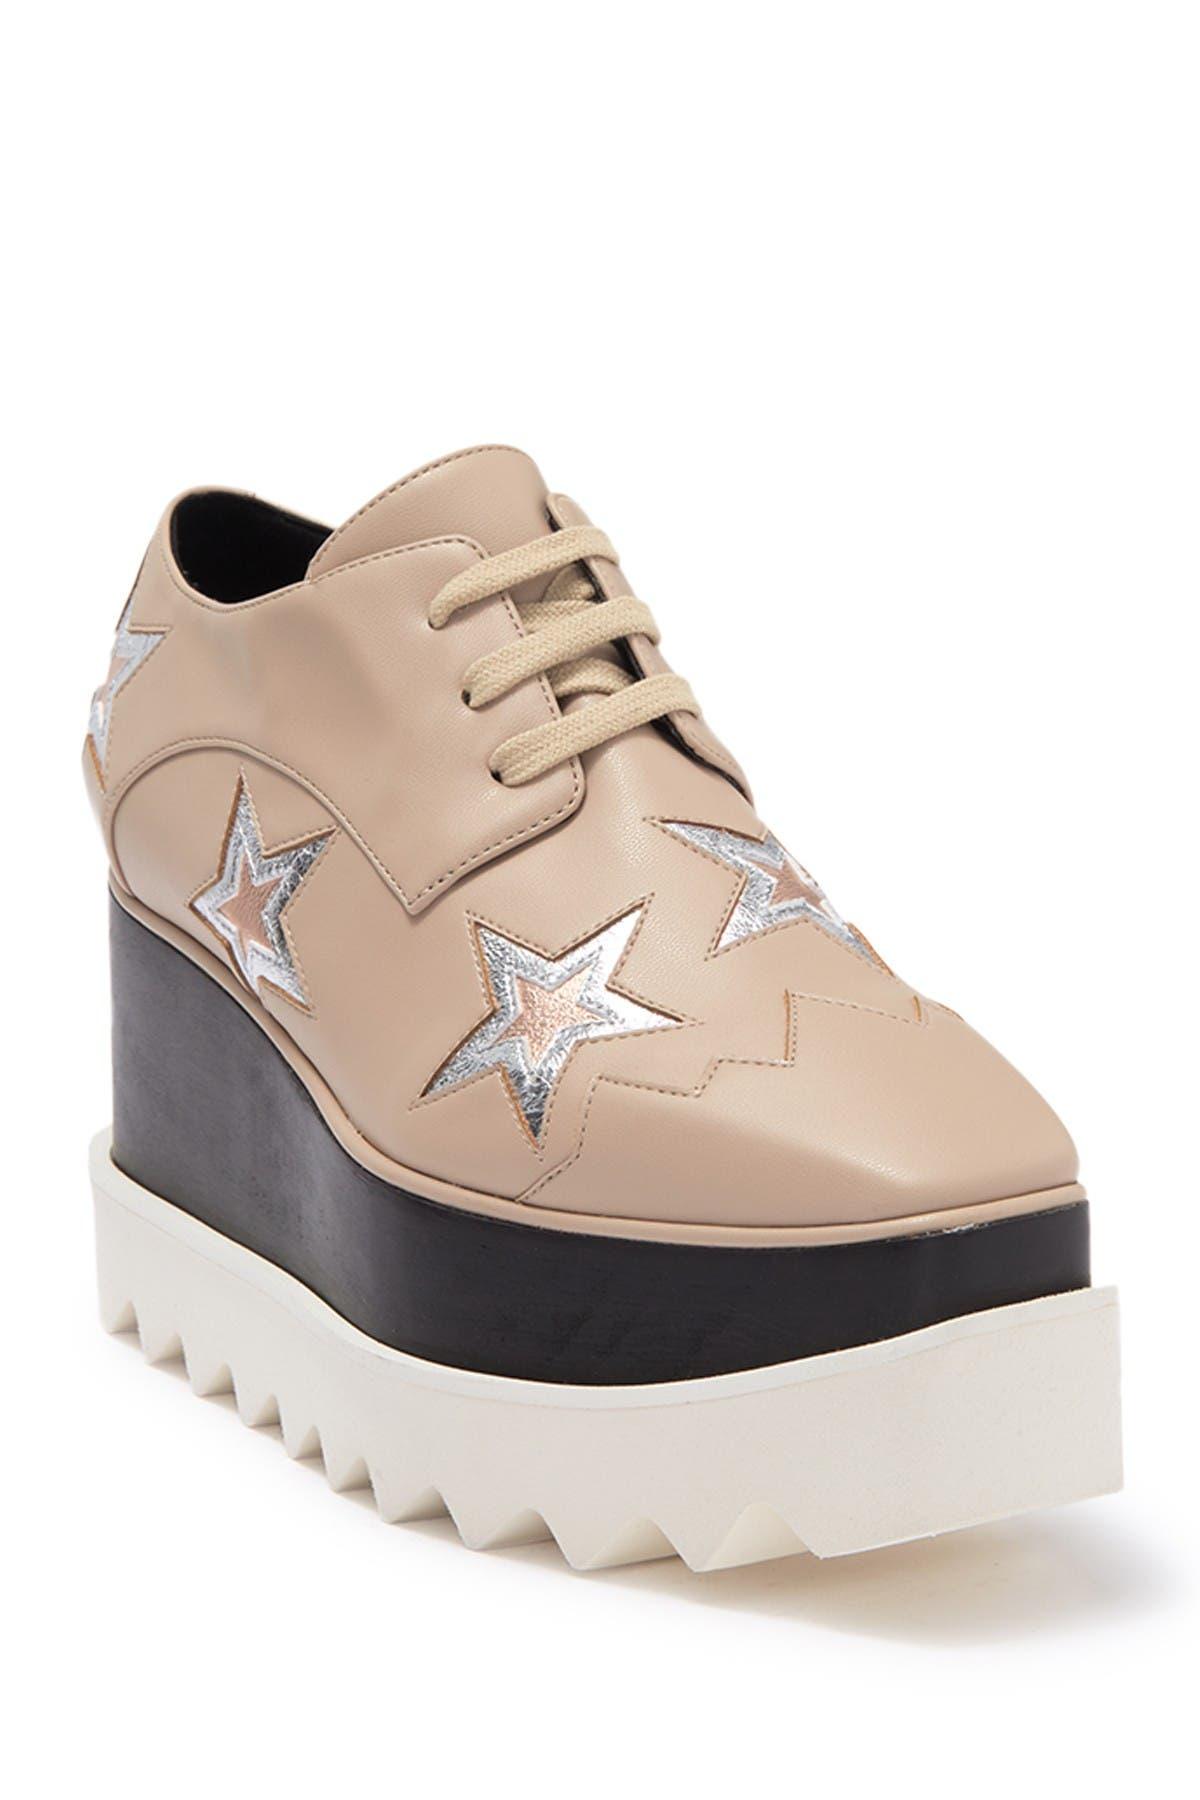 Image of Stella McCartney Lace-Up Platform Derby Sneaker